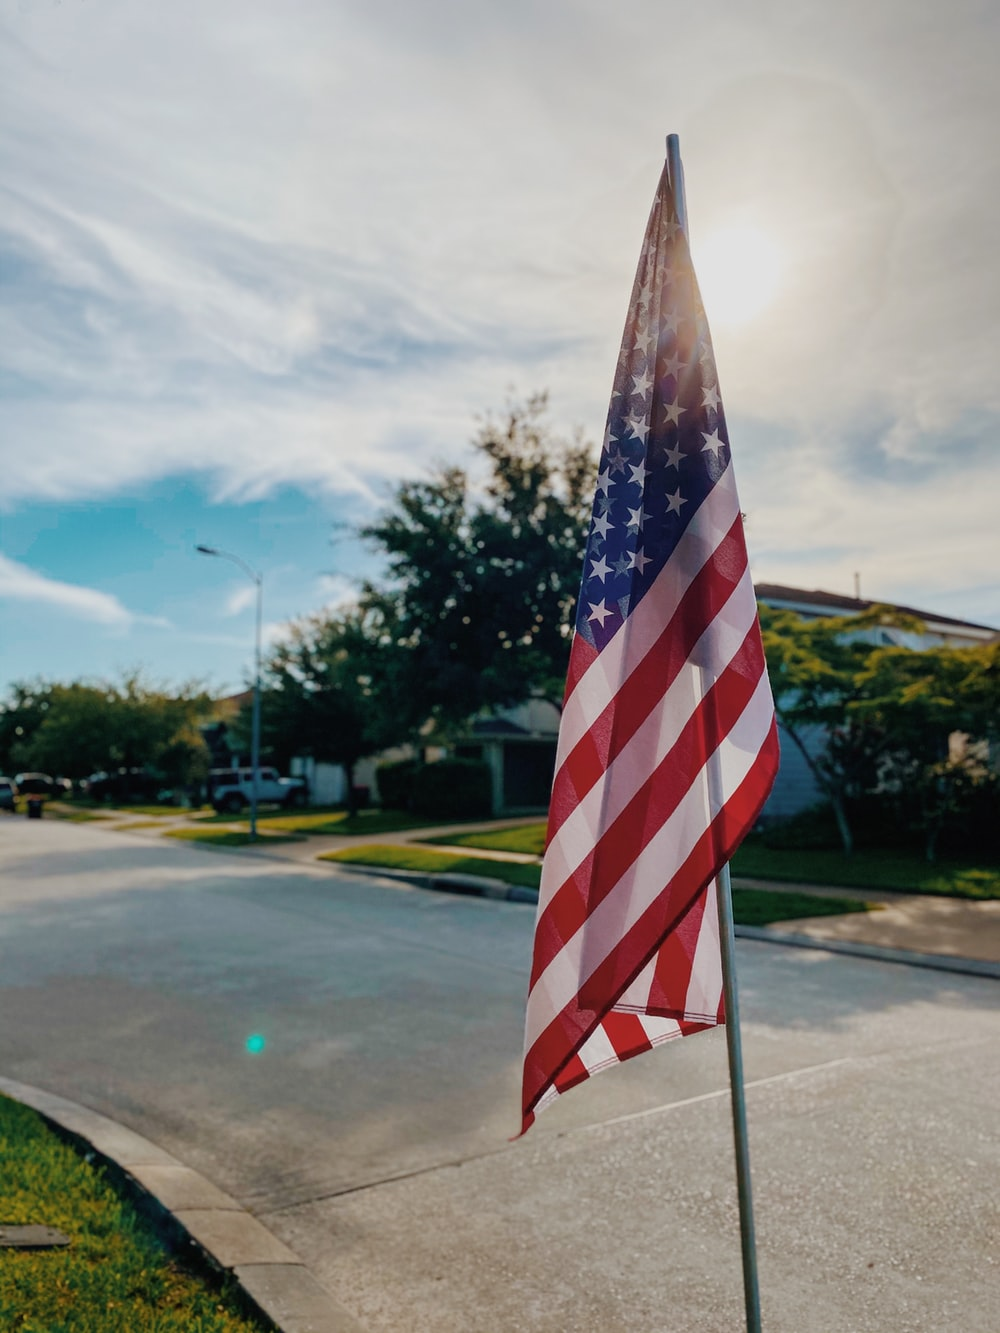 us a flag on gray asphalt road during daytime